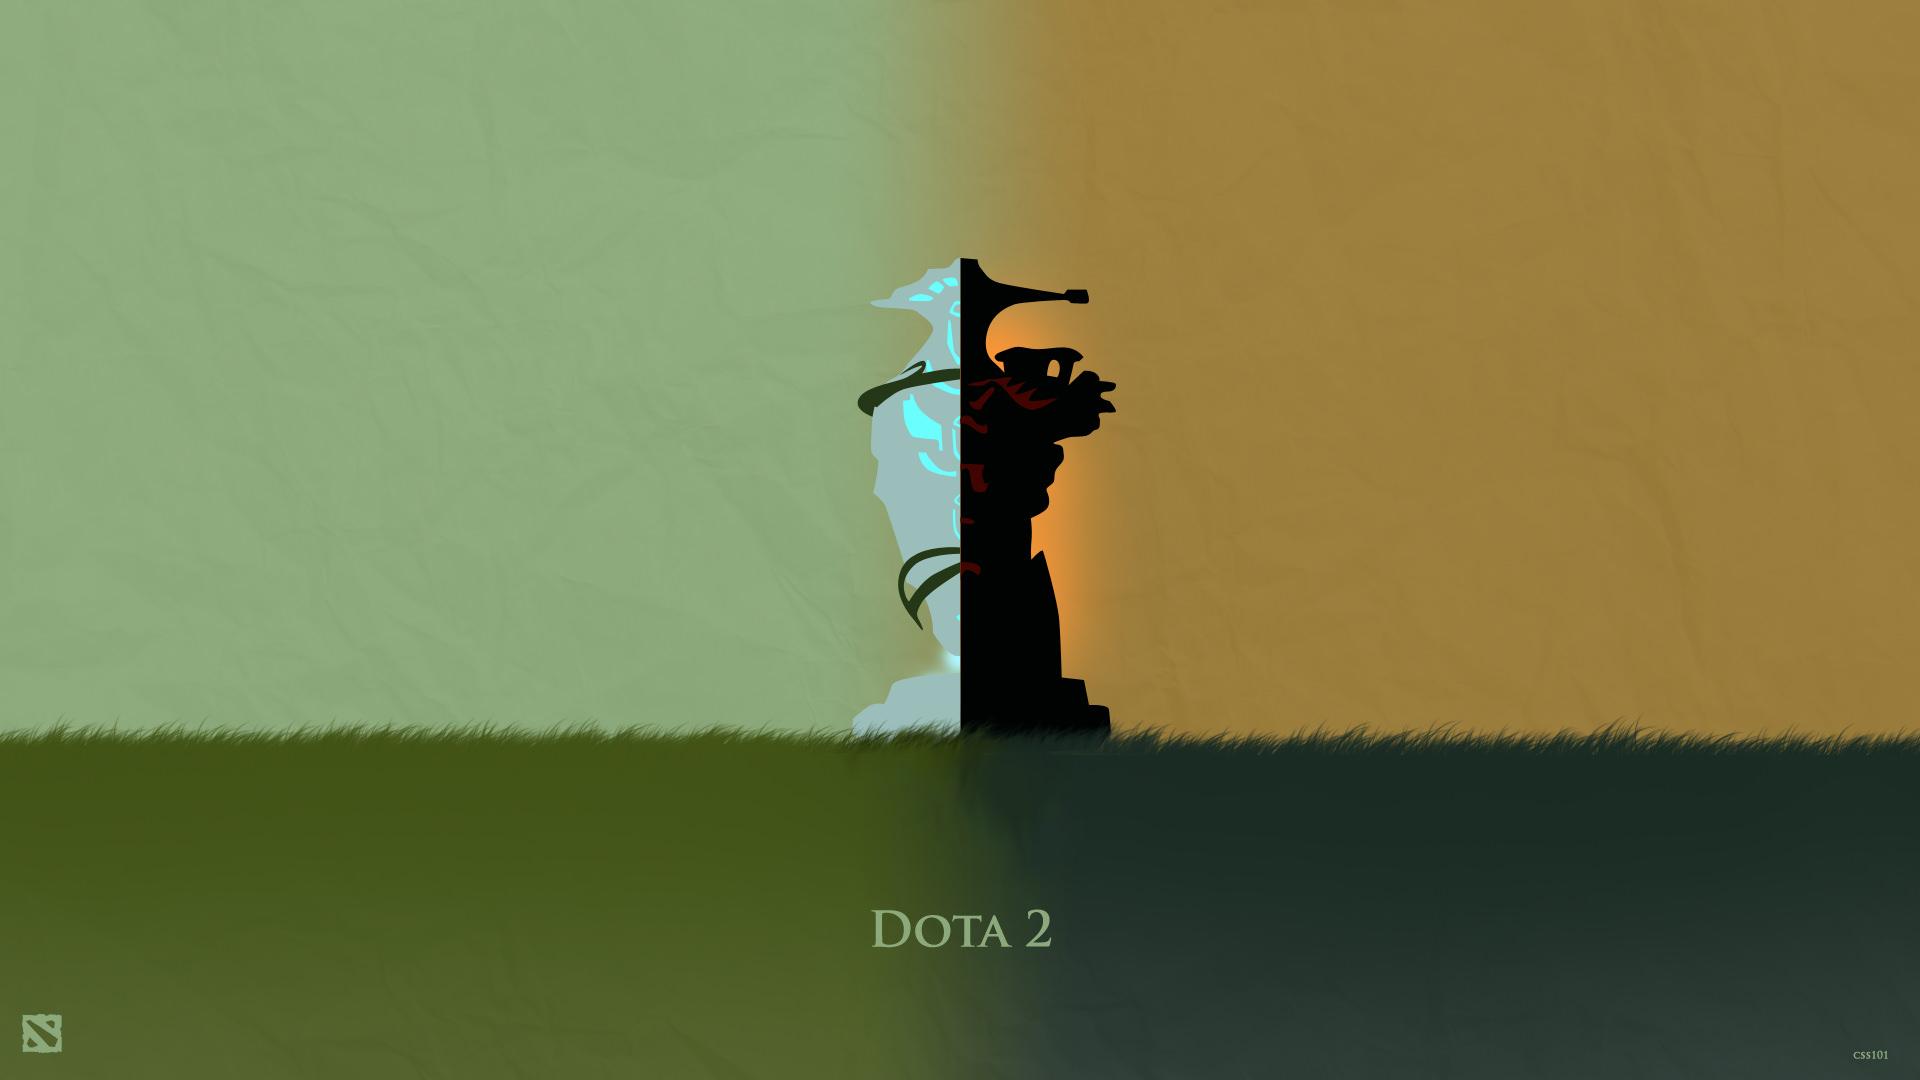 50 Beautiful Dota 2 Posters Heroes Silhouette Hd Wallpapers